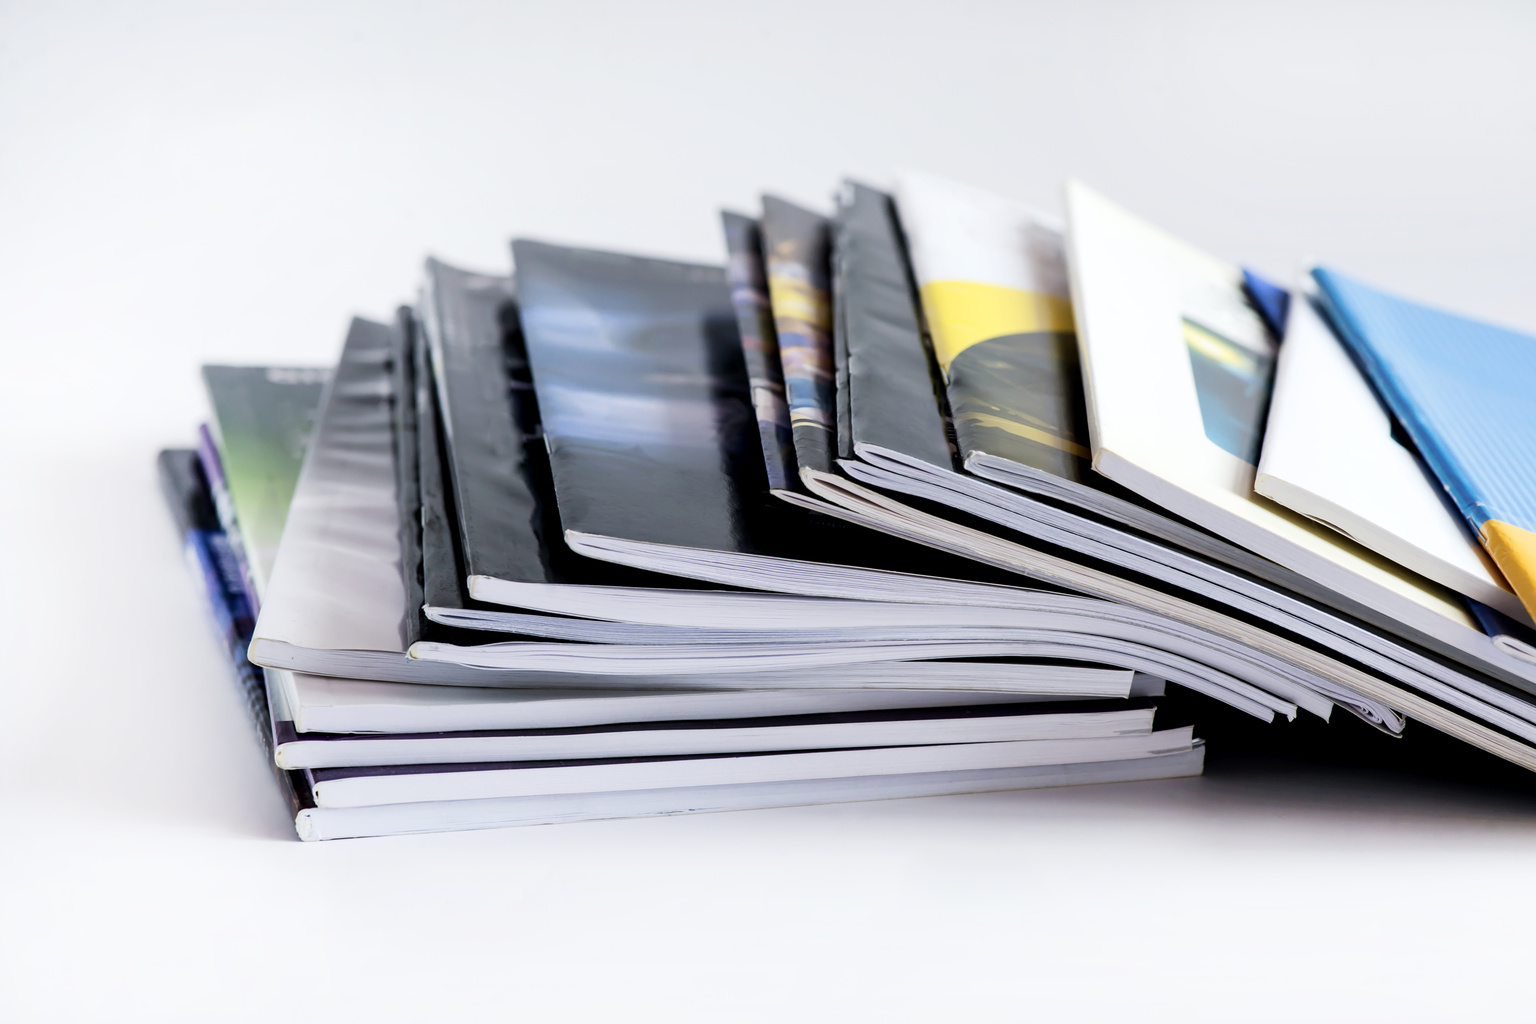 Choosing a journal for your manuscript